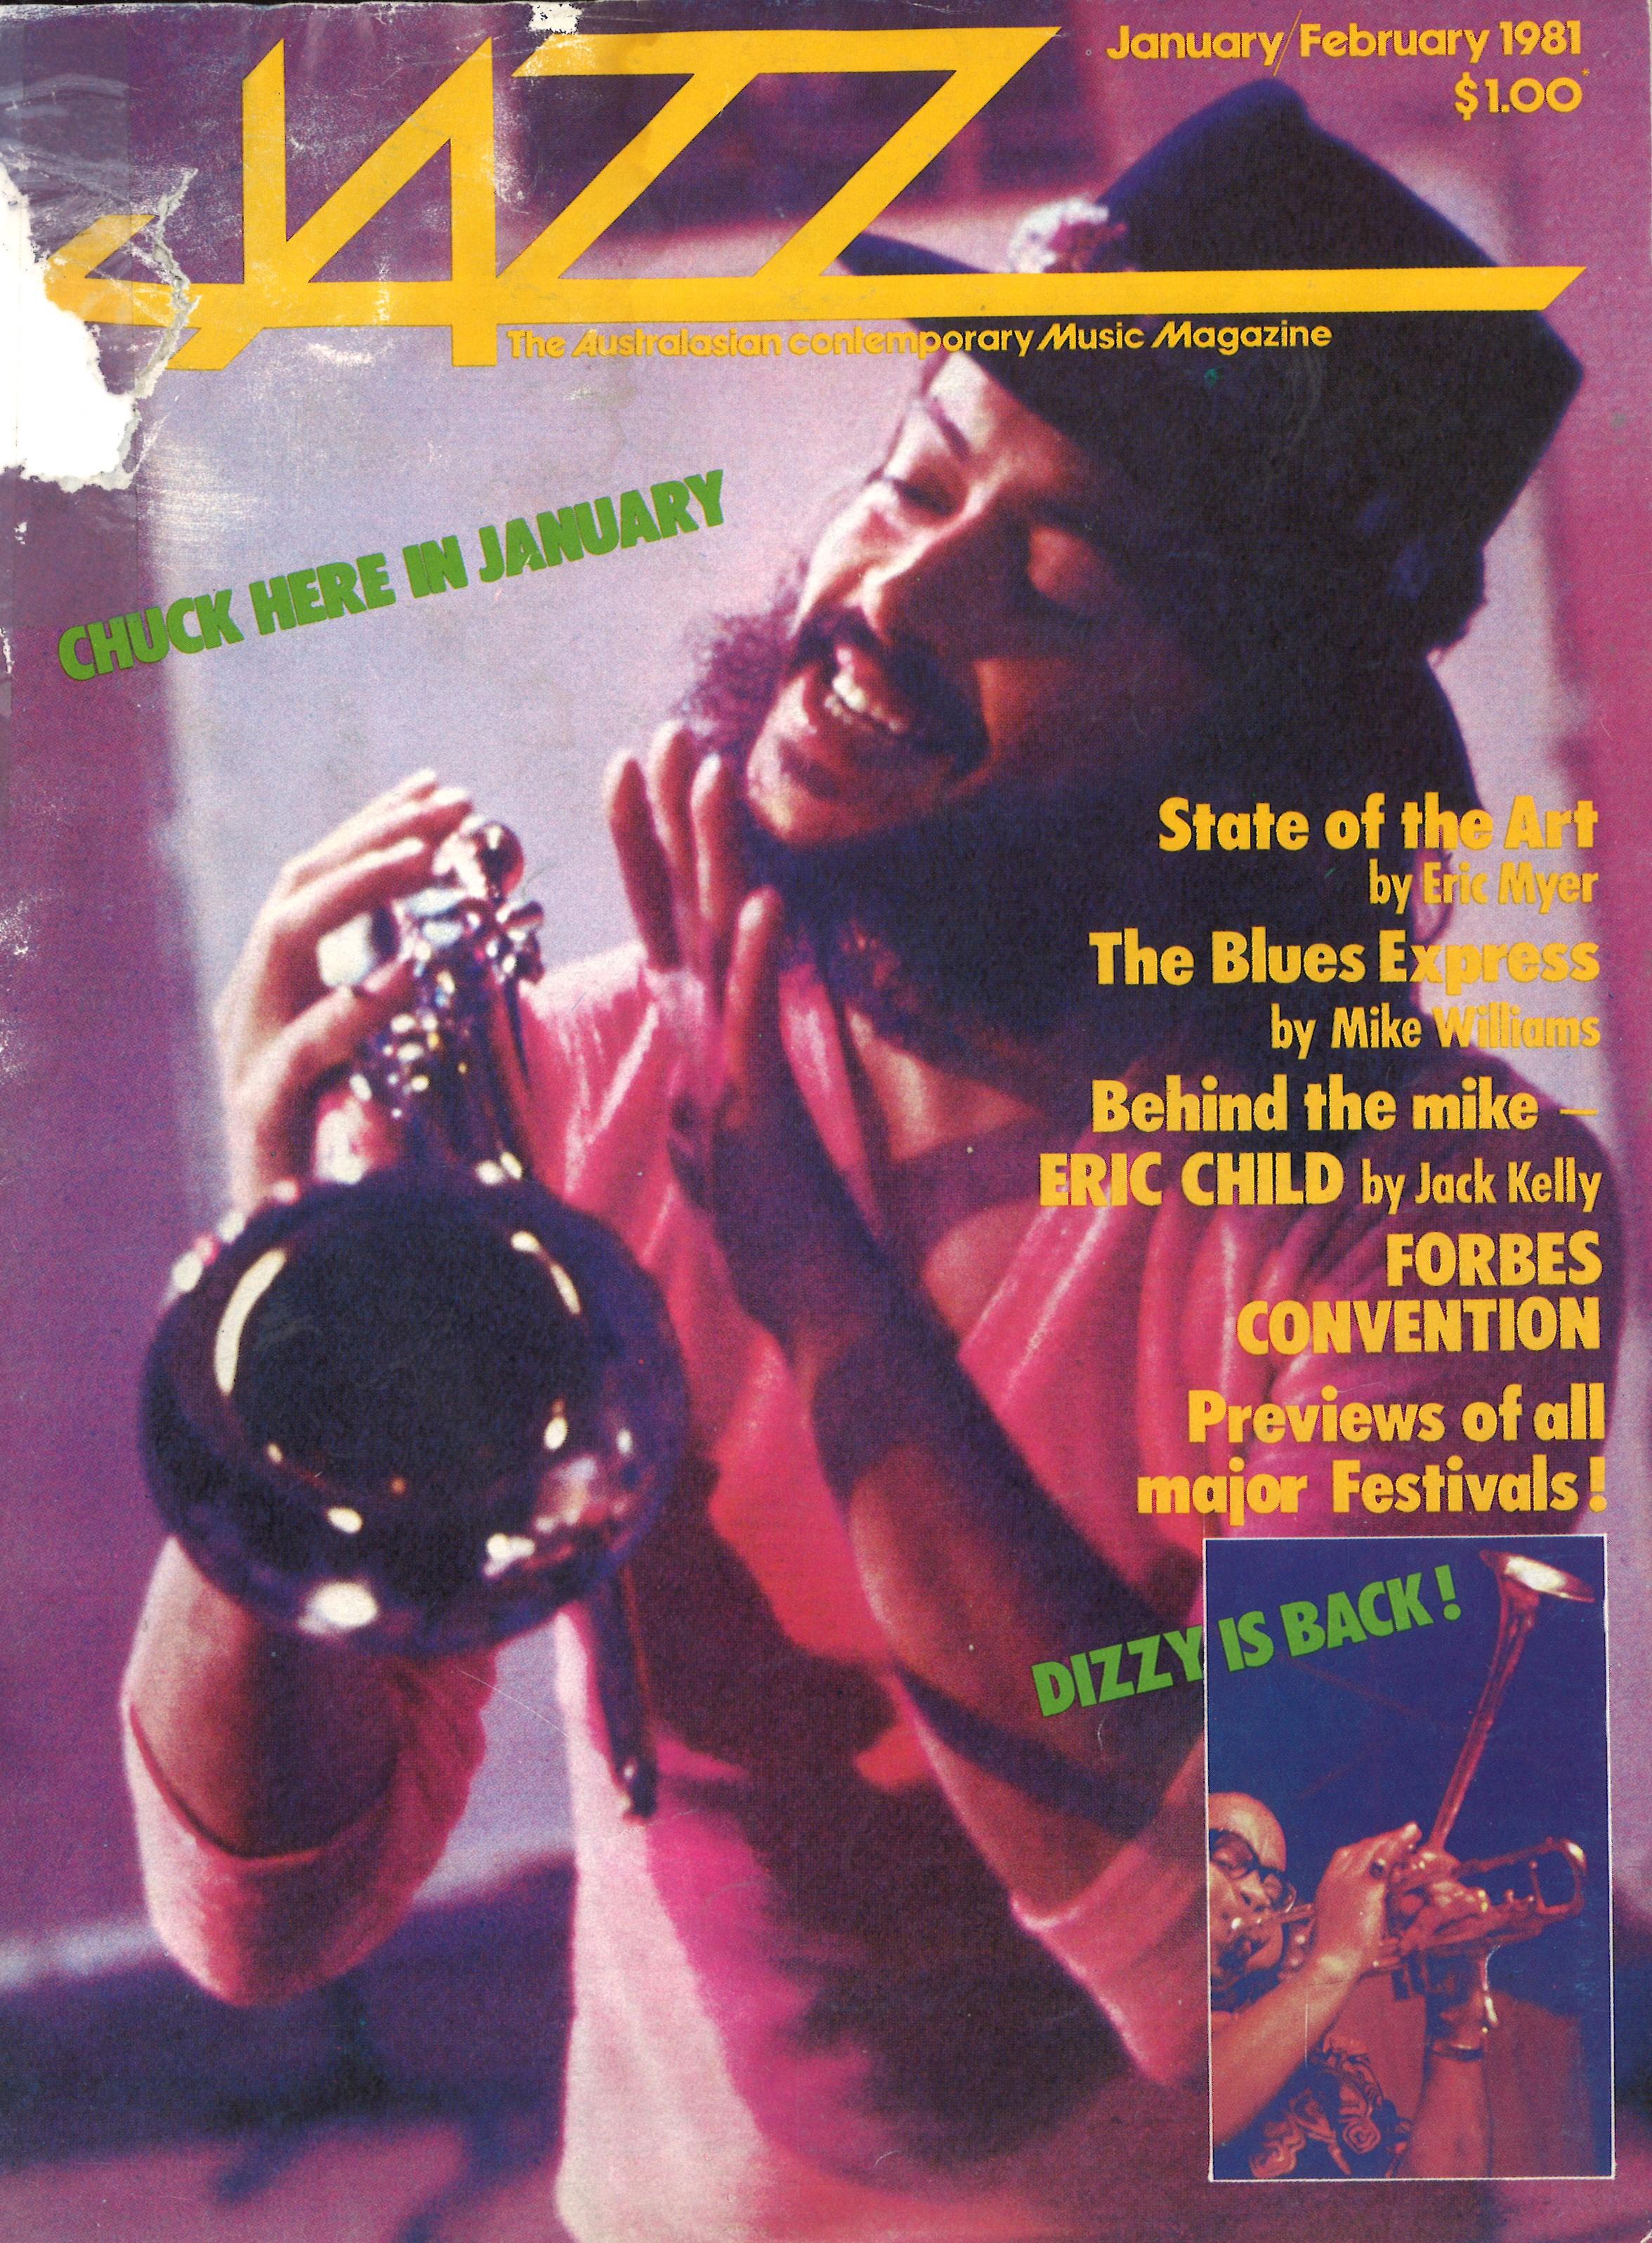 JazzMagazineJanFeb81FrontCover.jpg